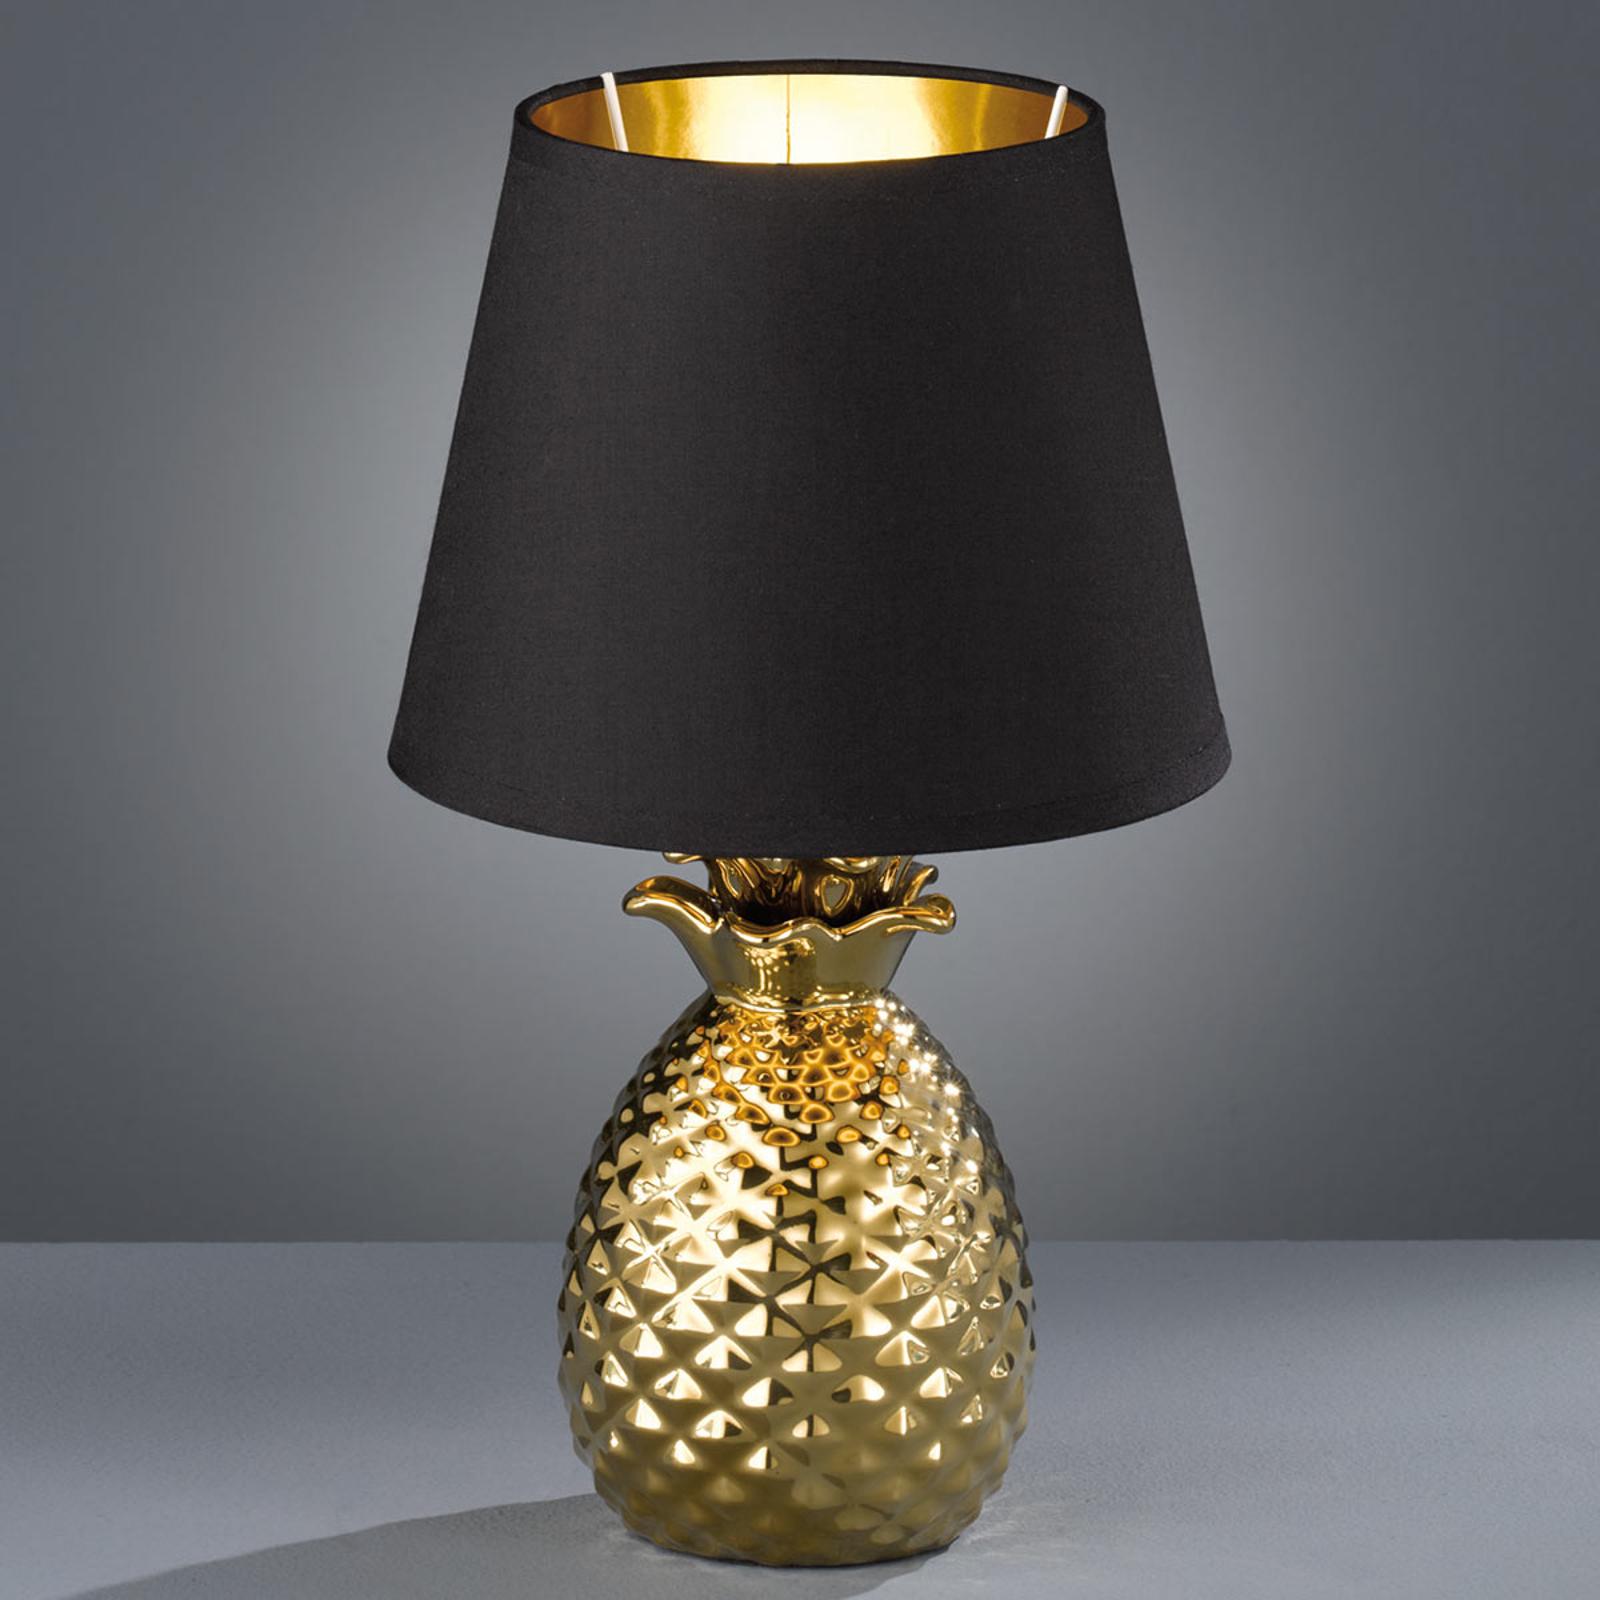 Ståtlig bordslampa i keramik Pineapple, guld-svart